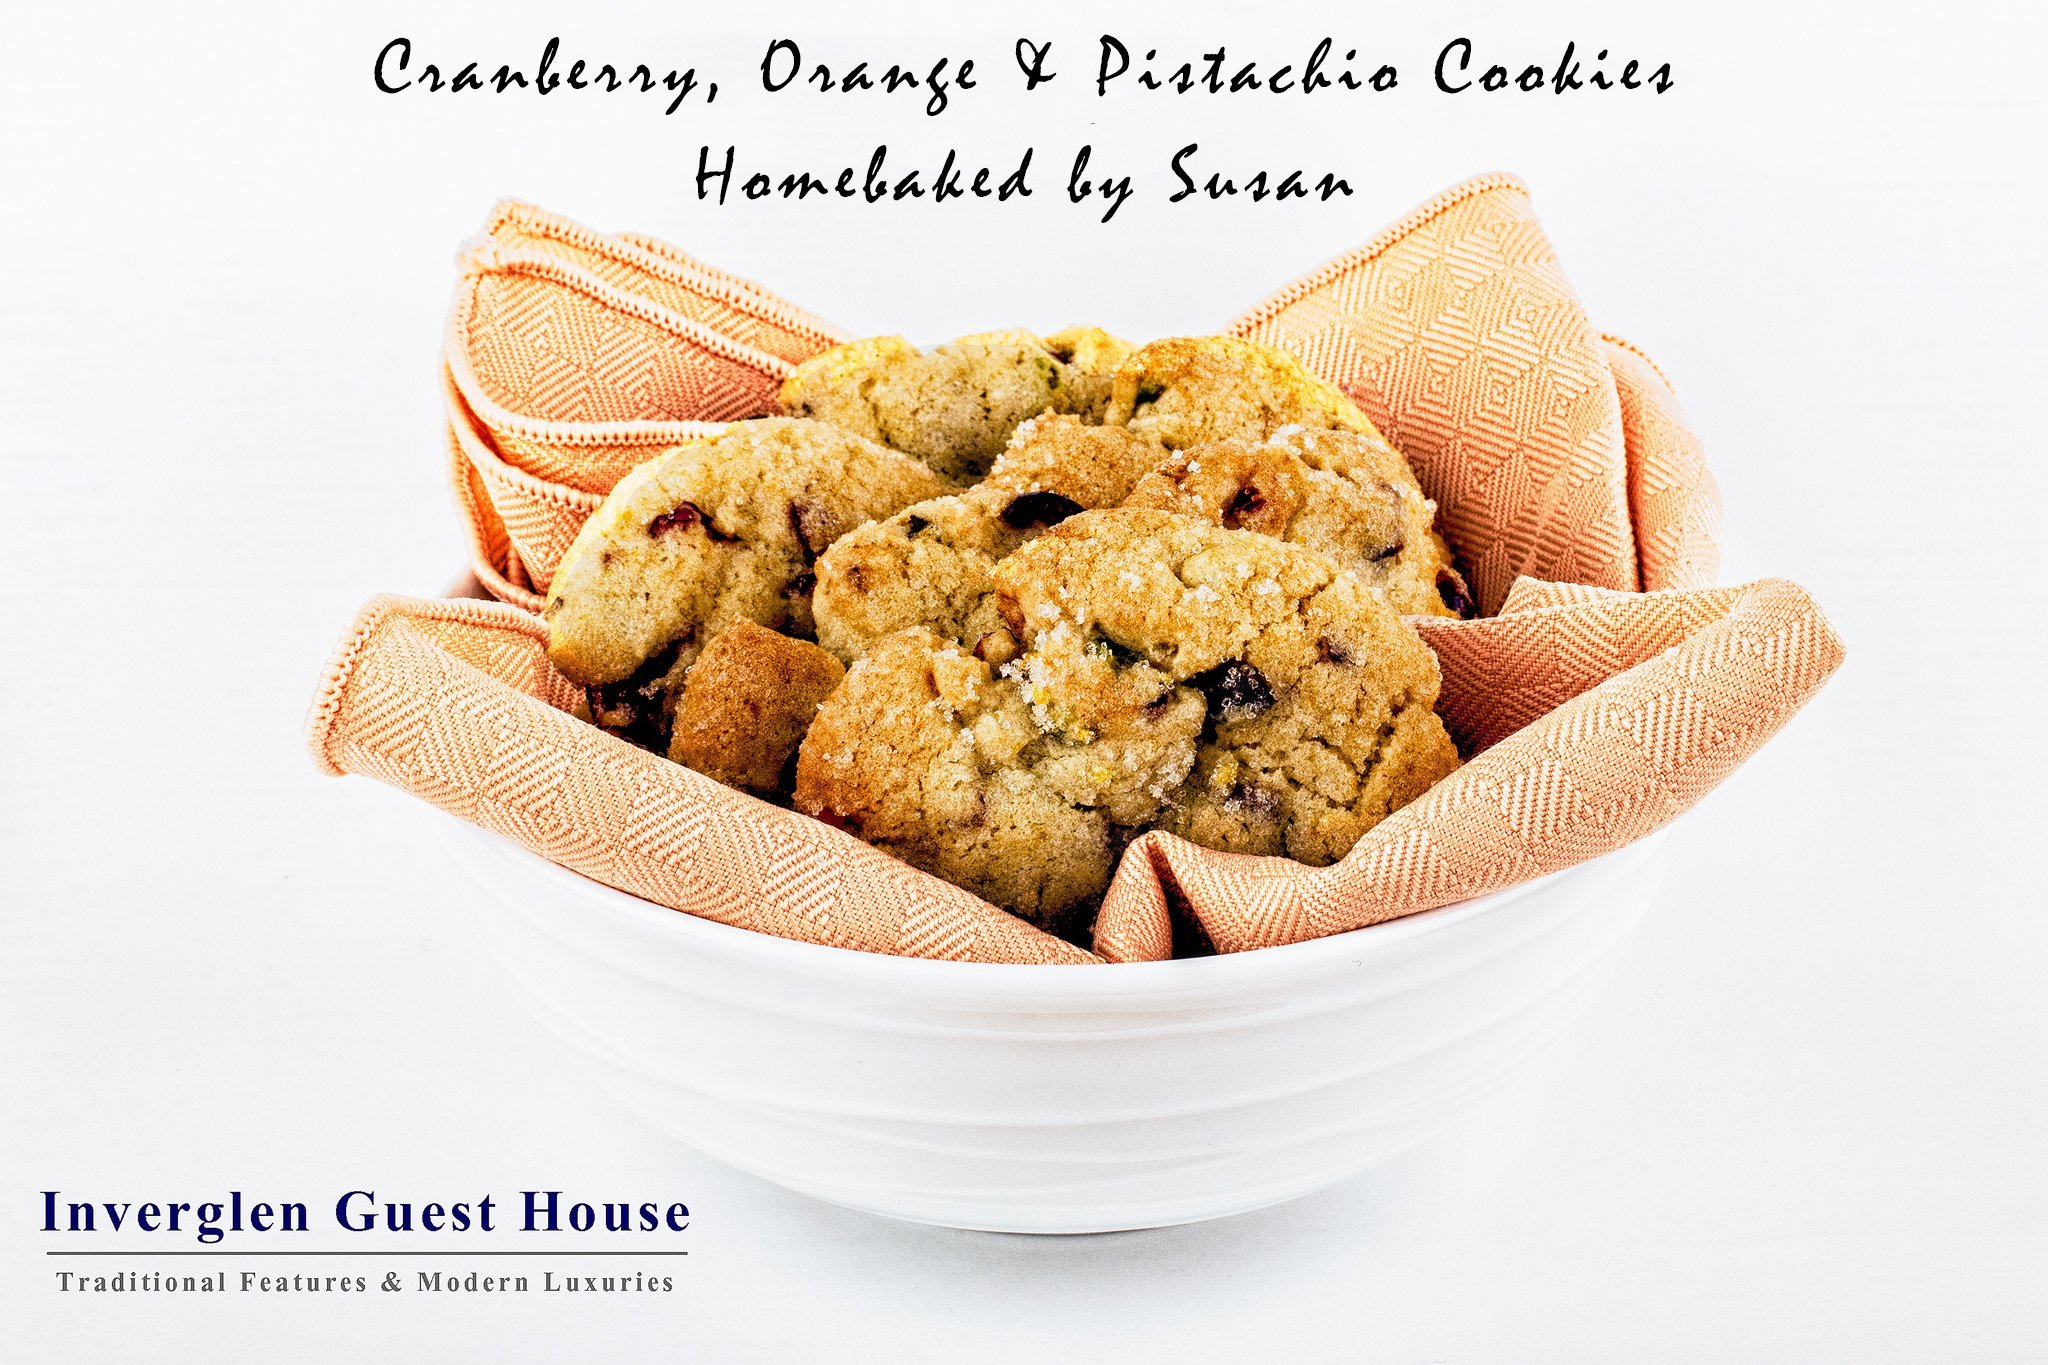 Cranberry Orange and Pistachio Cookies